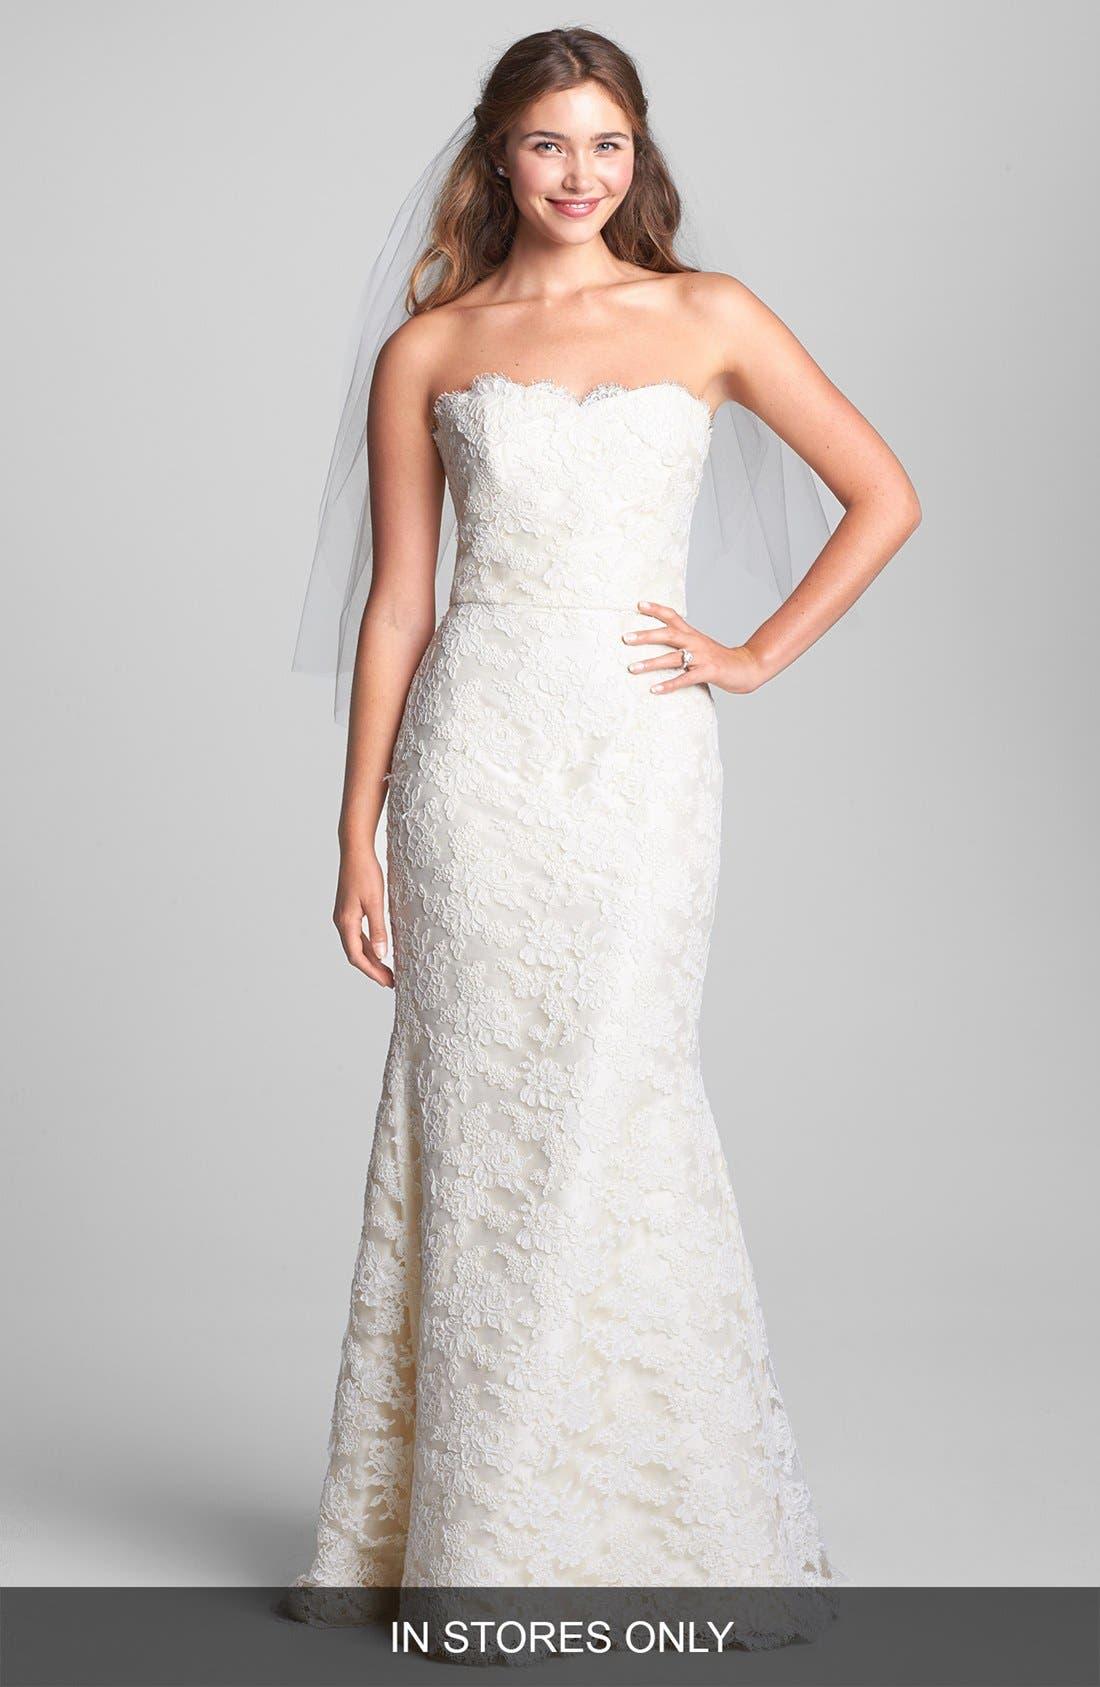 Alternate Image 1 Selected - Caroline DeVillo 'Eliza' Strapless Alençon Lace Mermaid Dress (In Stores Only)